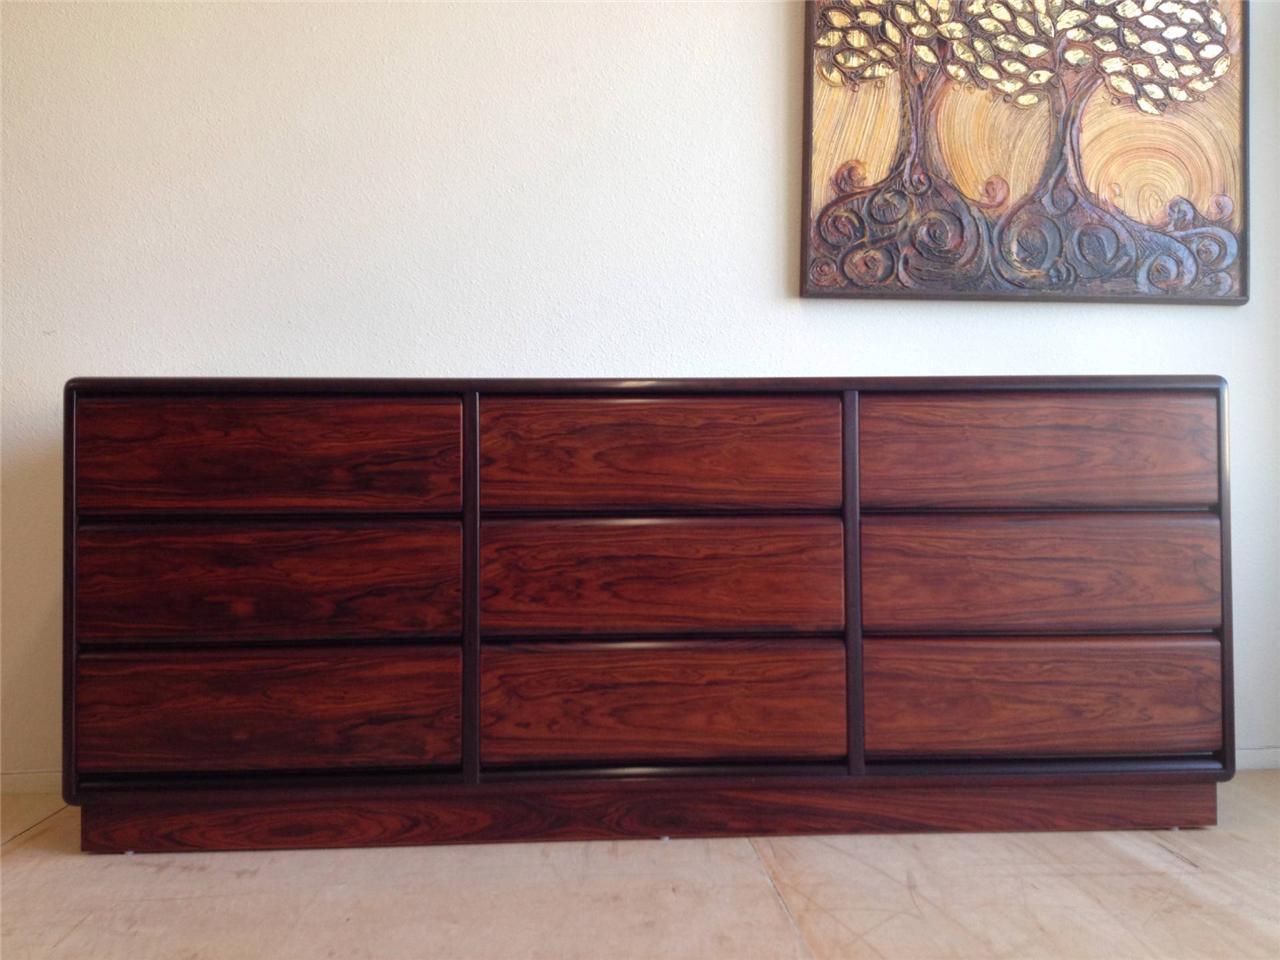 danish mid century modern vintage long brouer rosewood dresser chest of drawers ebay. Black Bedroom Furniture Sets. Home Design Ideas